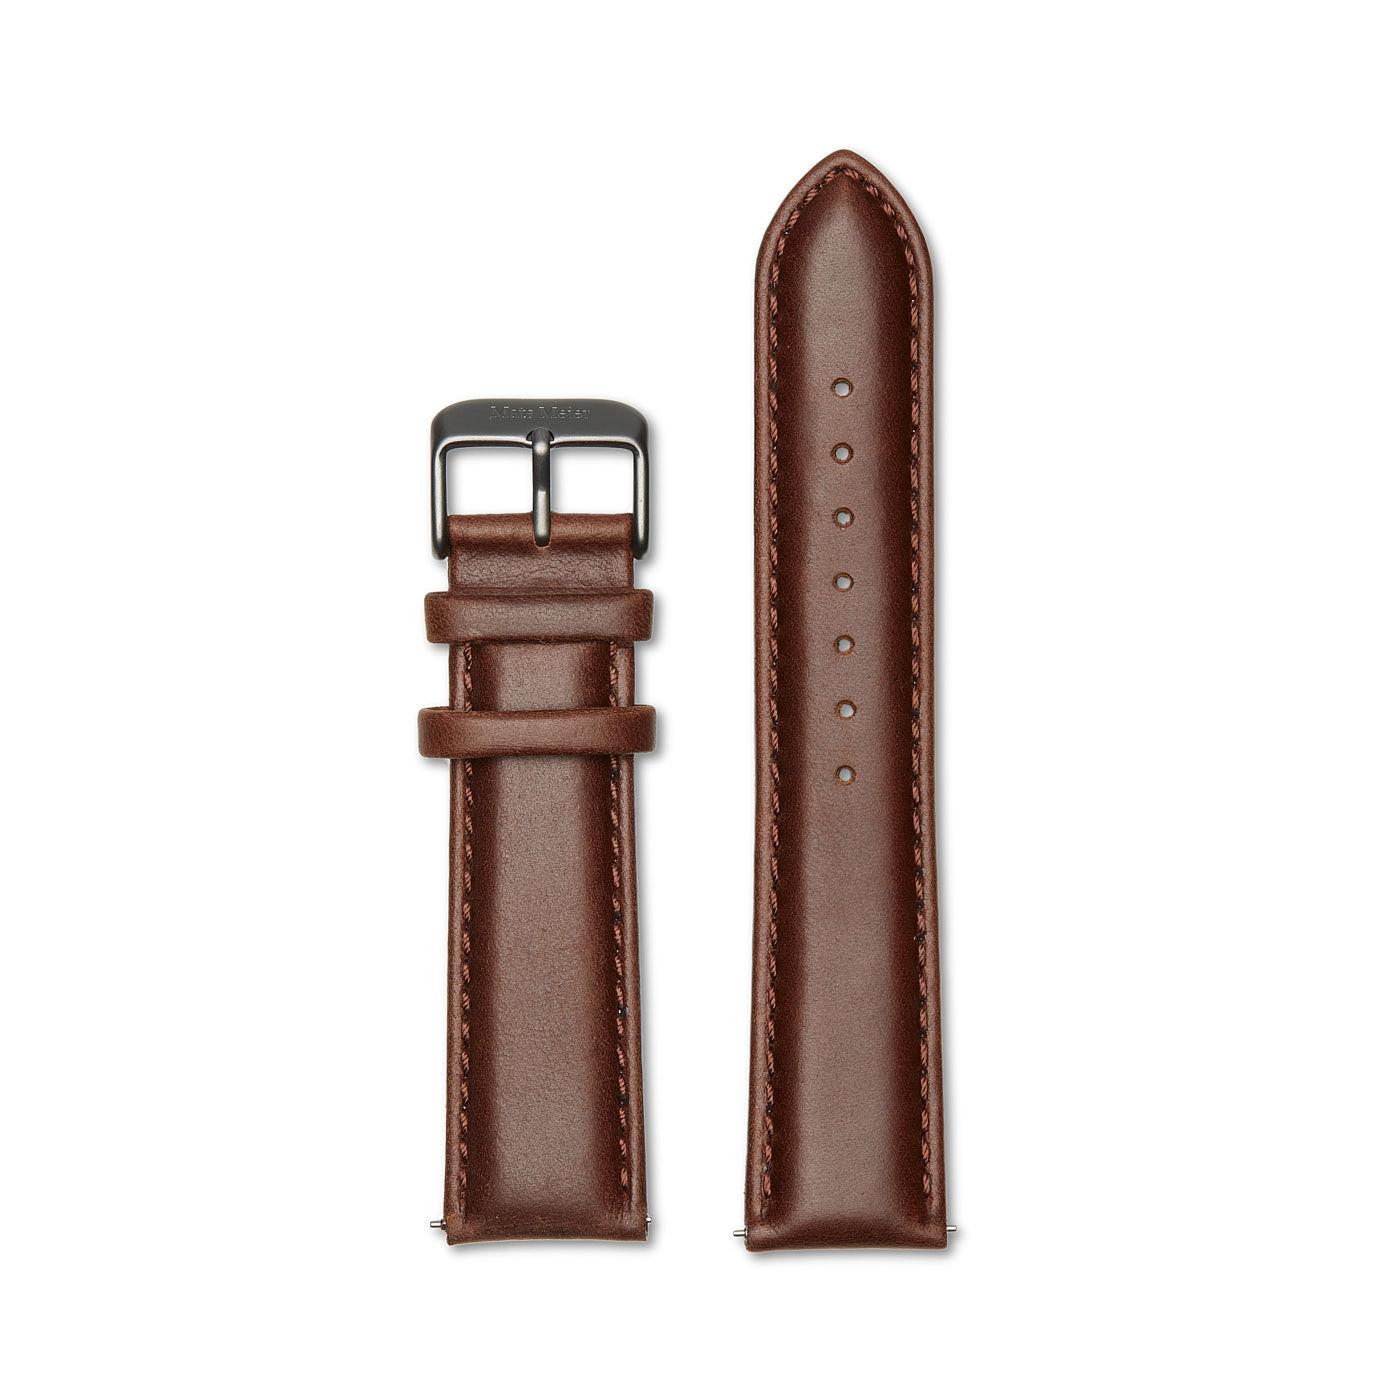 Mats Meier strap 20 mm walnut brown